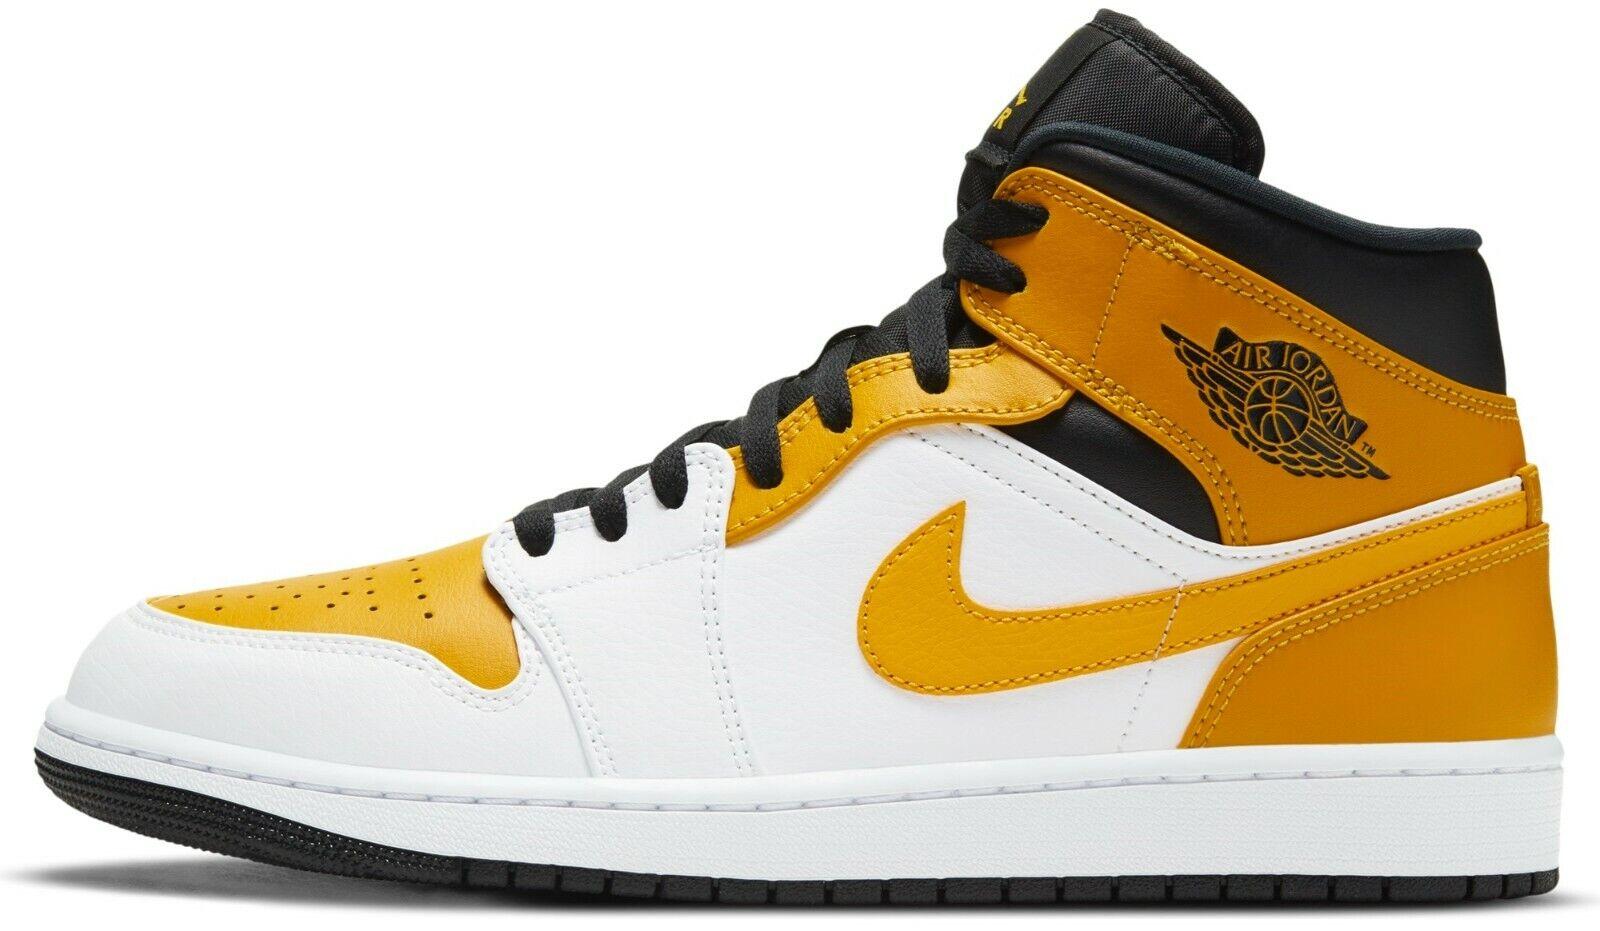 Size 10 - Jordan 1 Mid University Gold 2021 for sale online | eBay